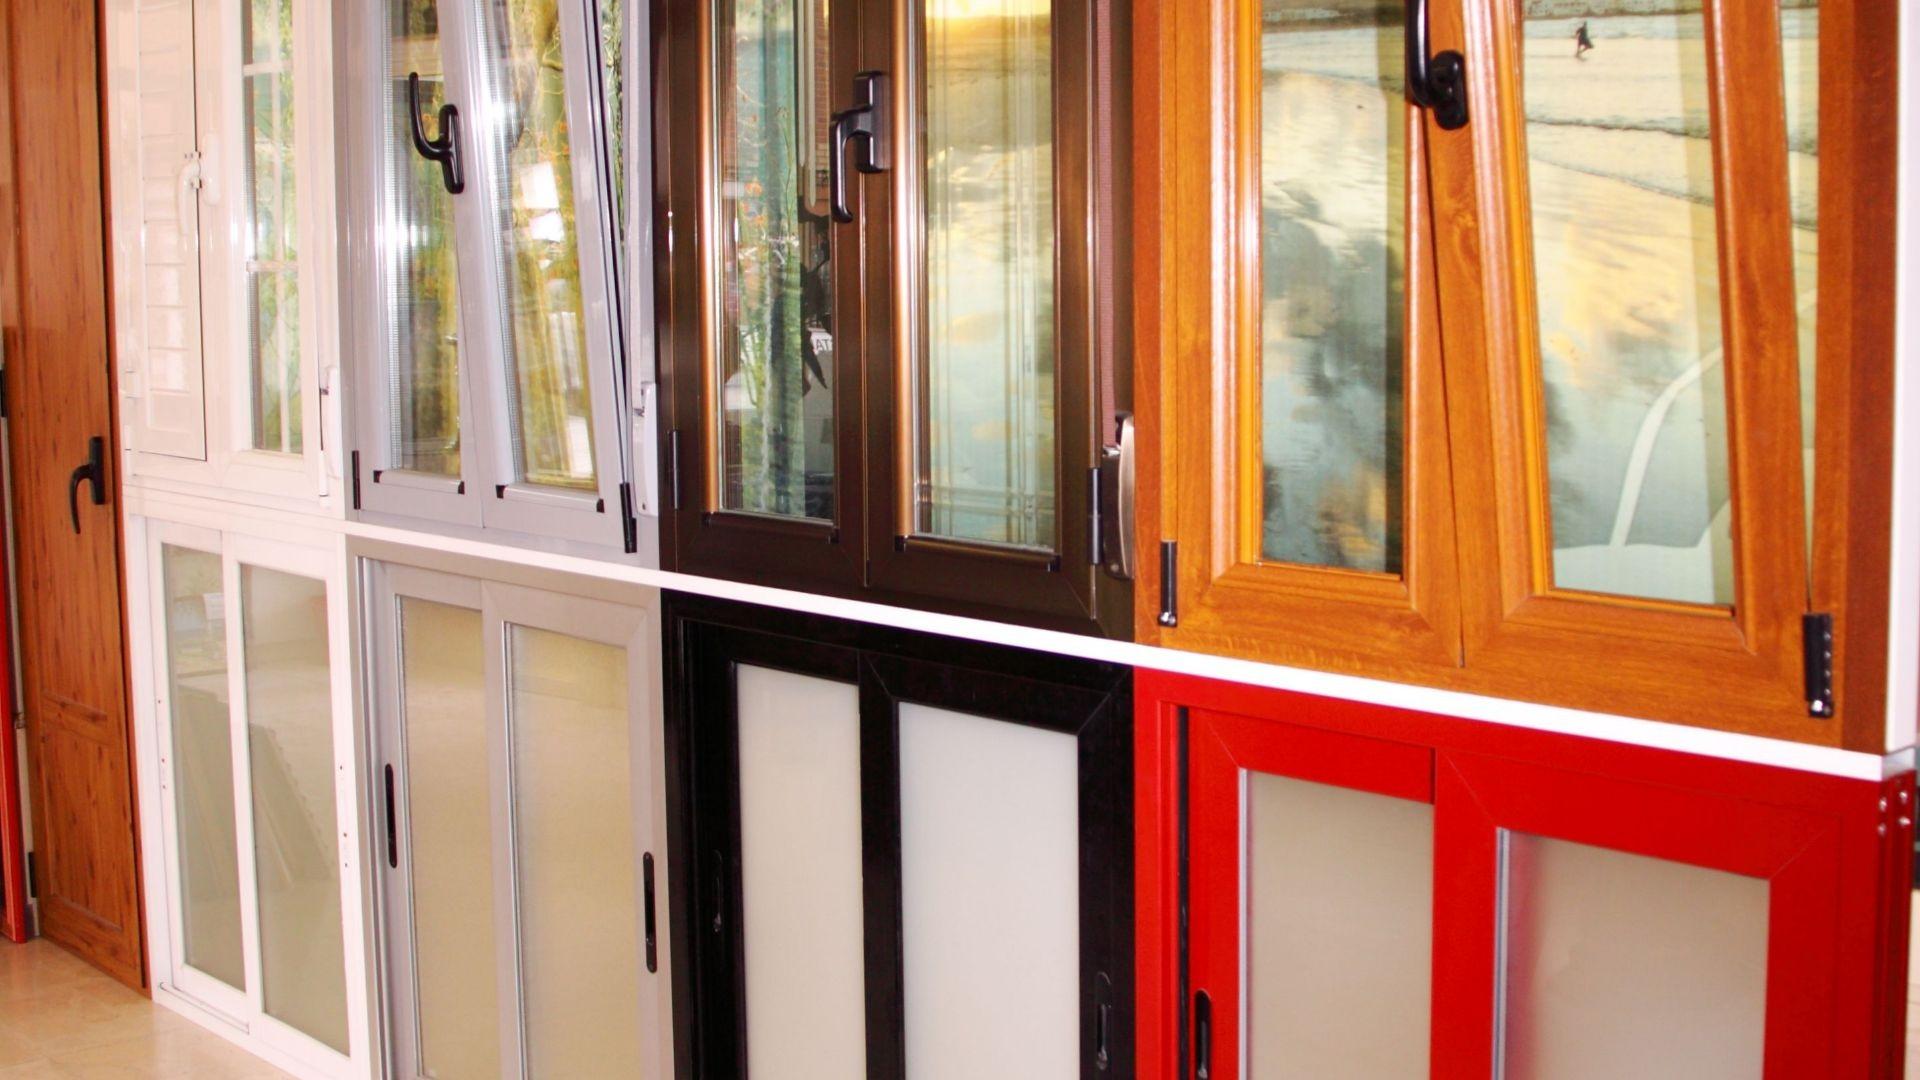 cristaleria-formas-ventanas-puertas-aluminio-pvc